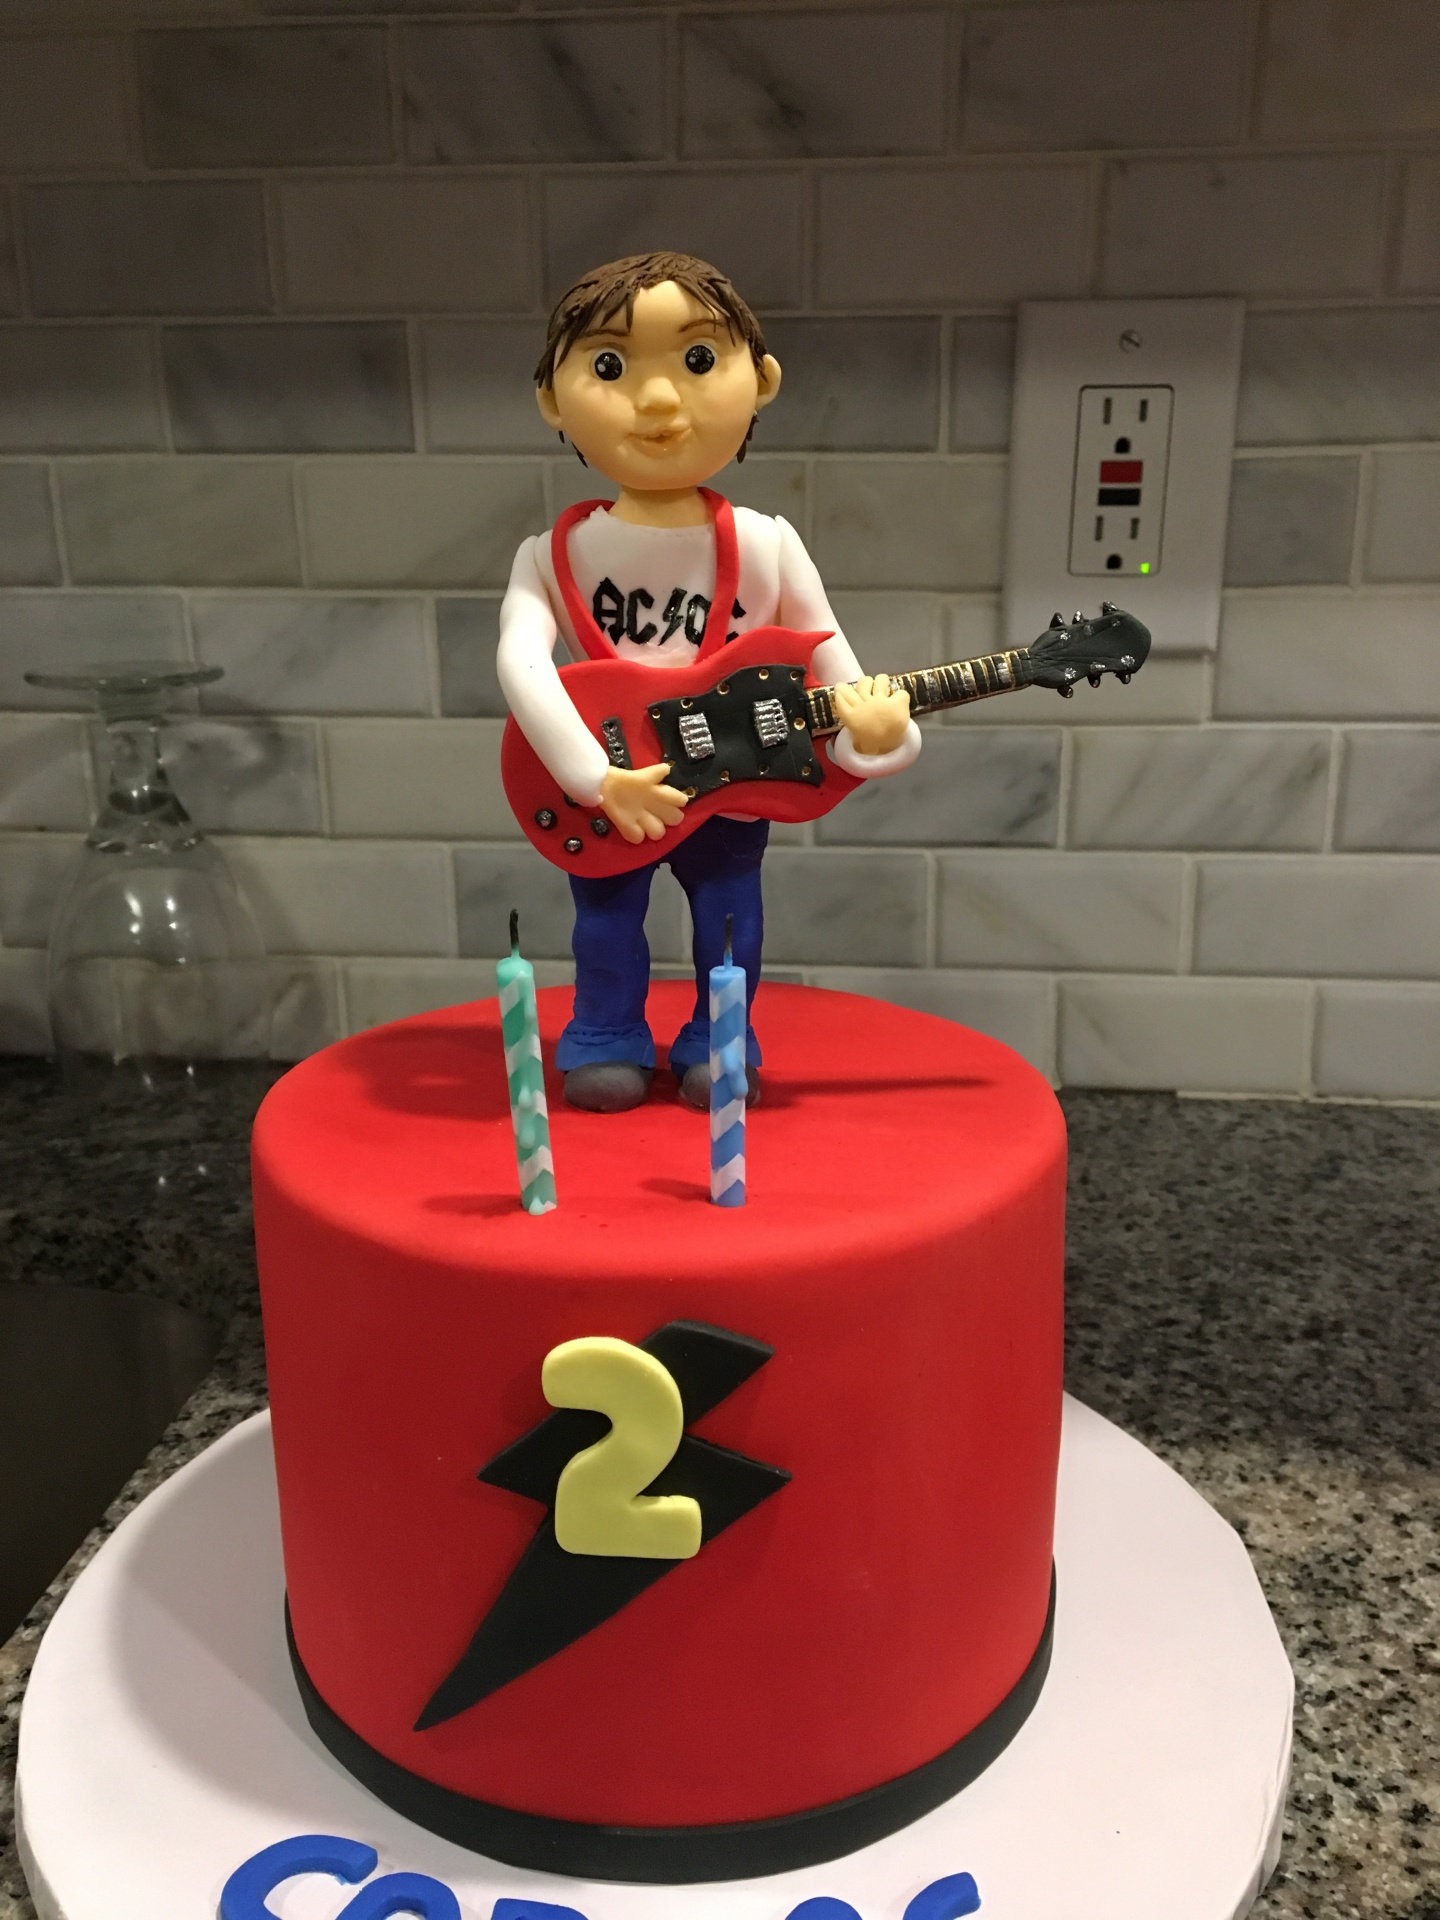 Custom Cakes NJ Music Themed cake for a second birthday